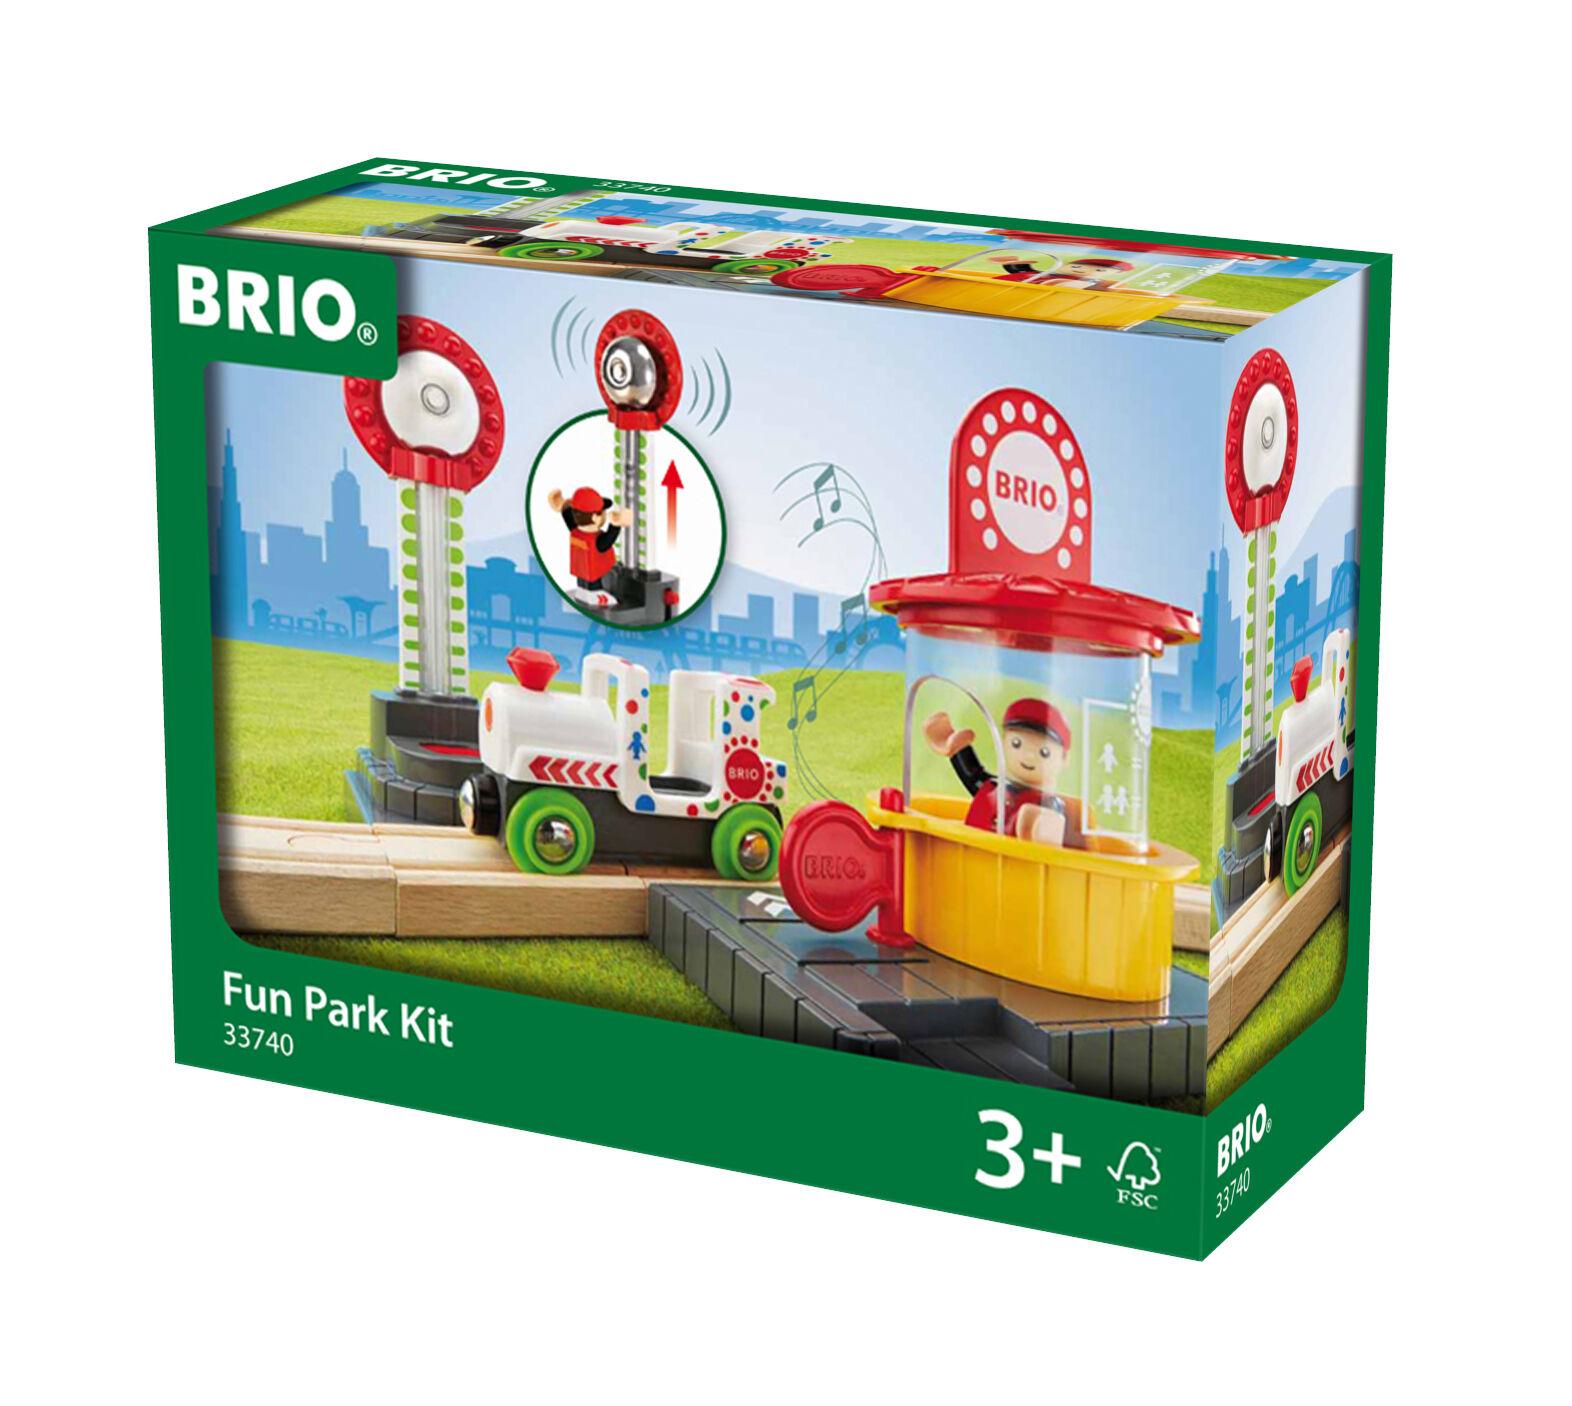 Wooden Railway Fun-Park Play Set Brio